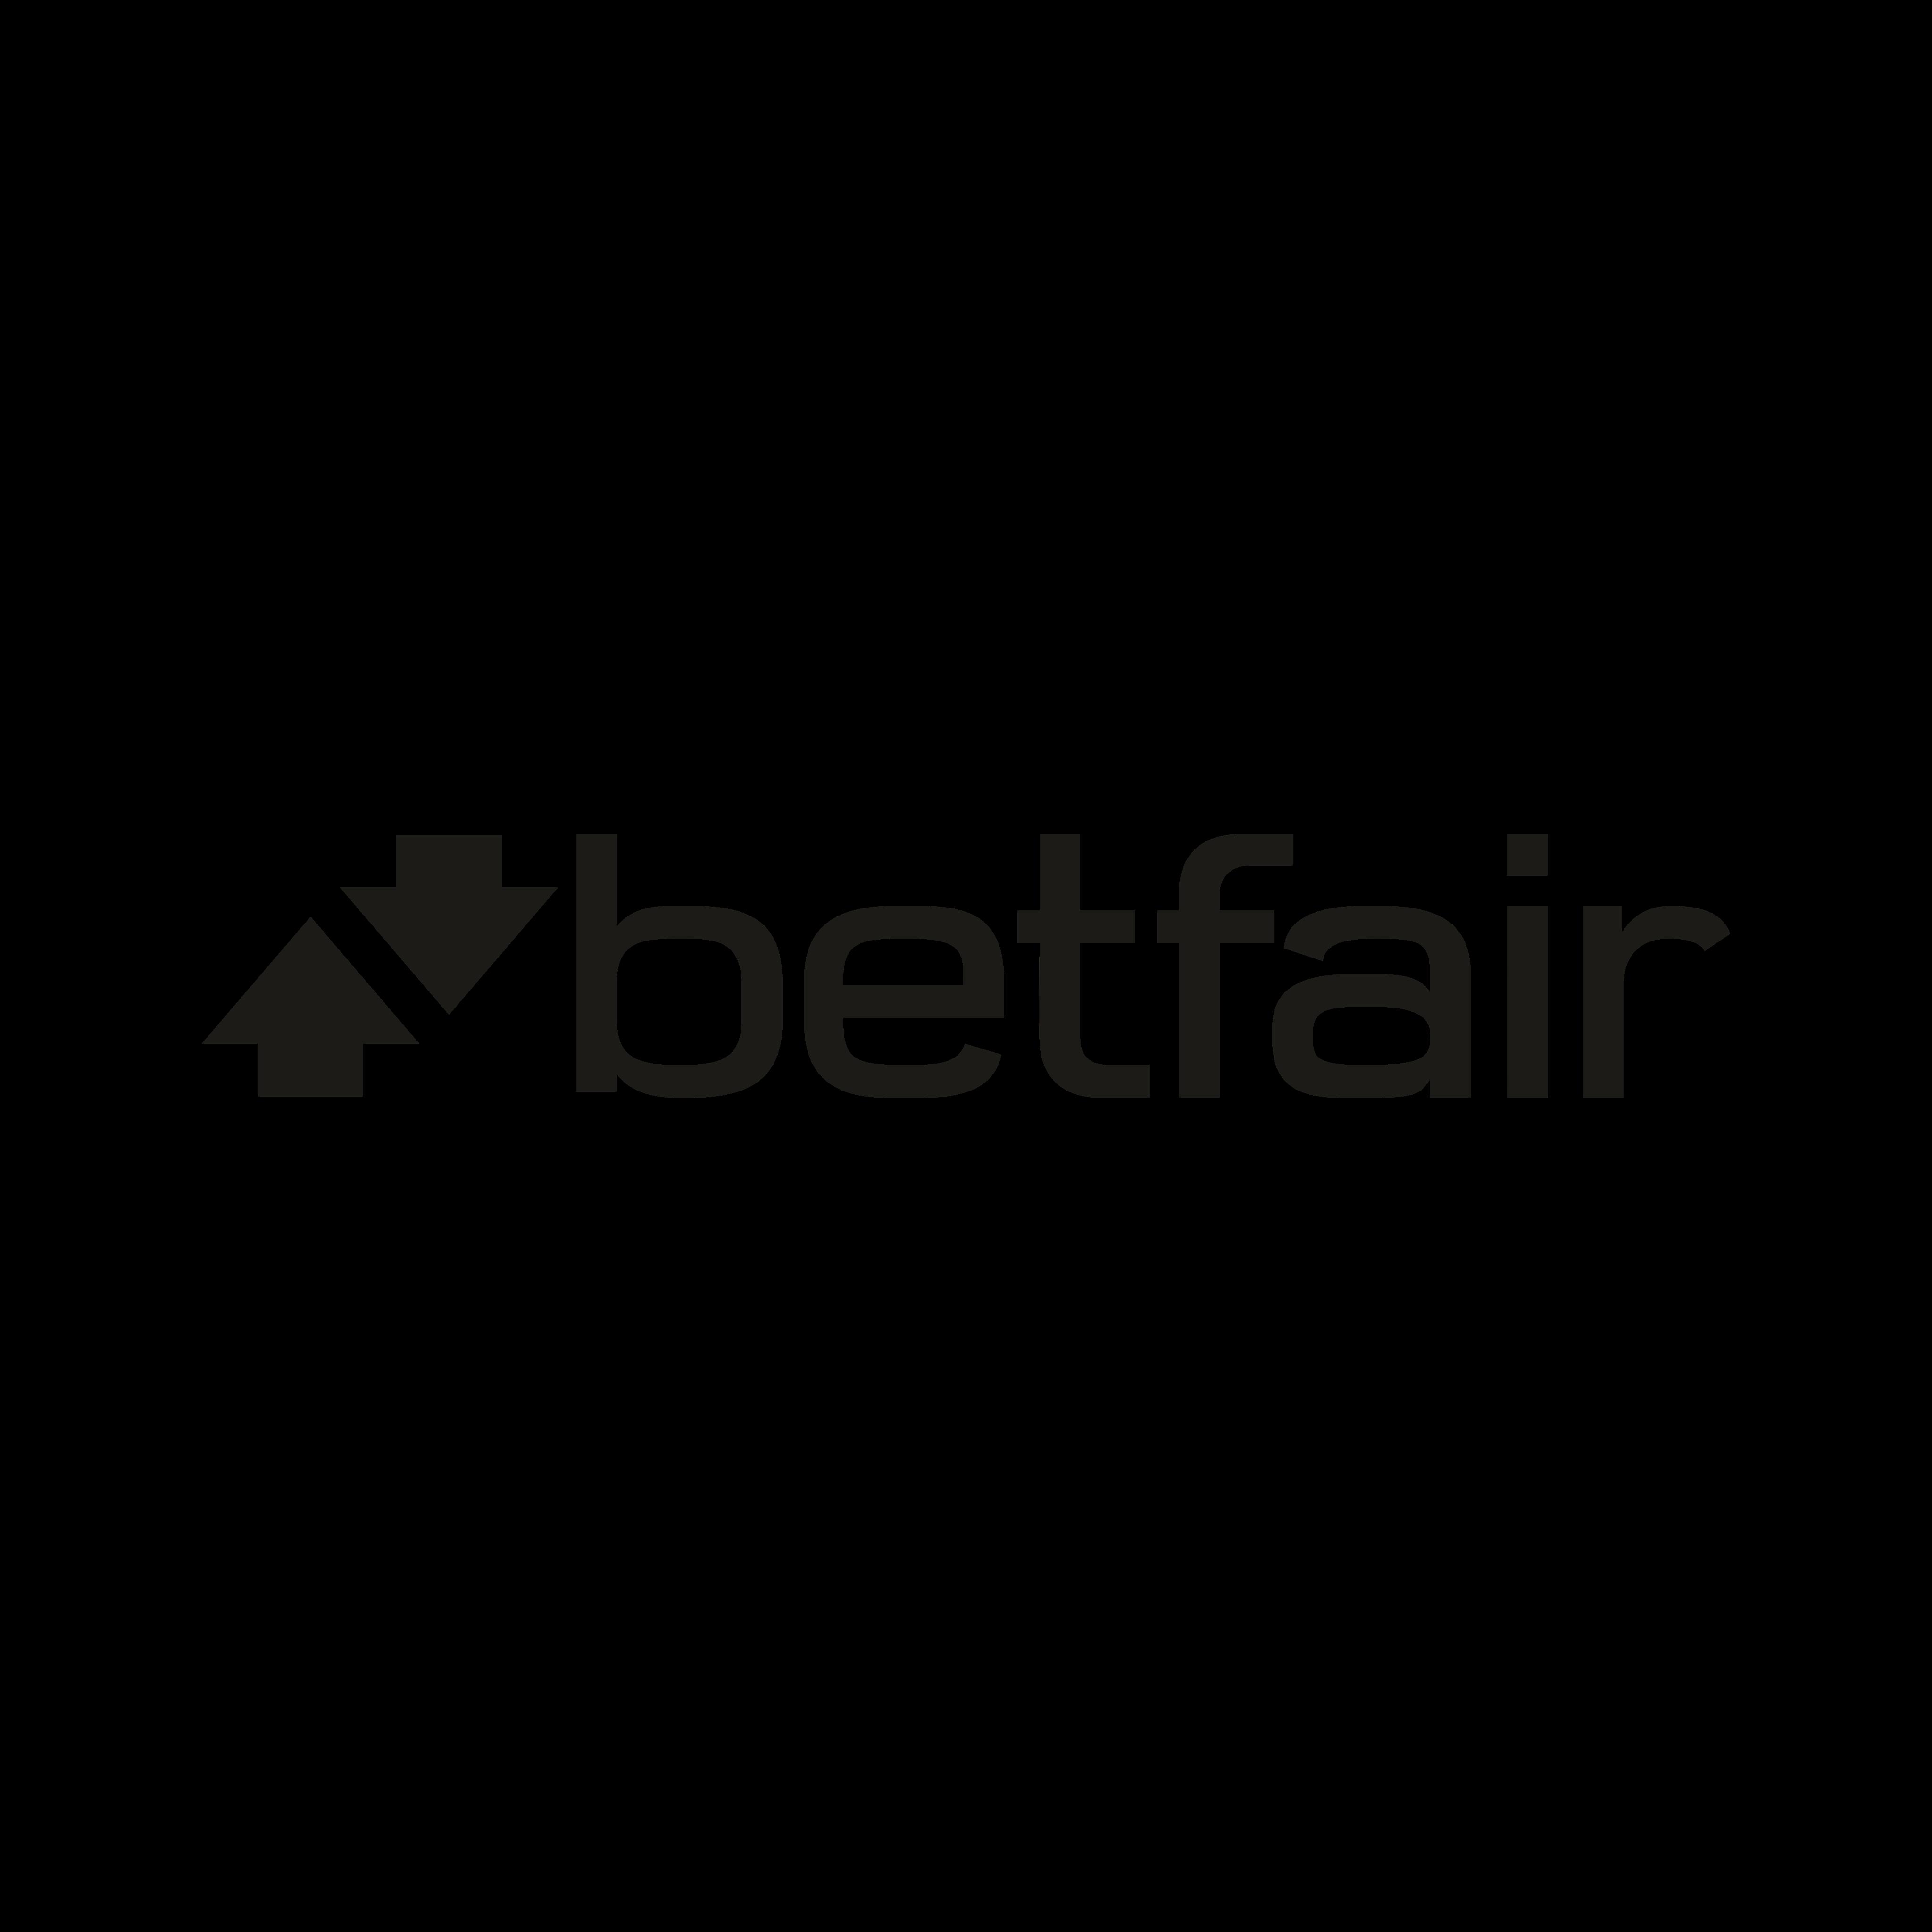 betfair logo 0 - Betfair Logo